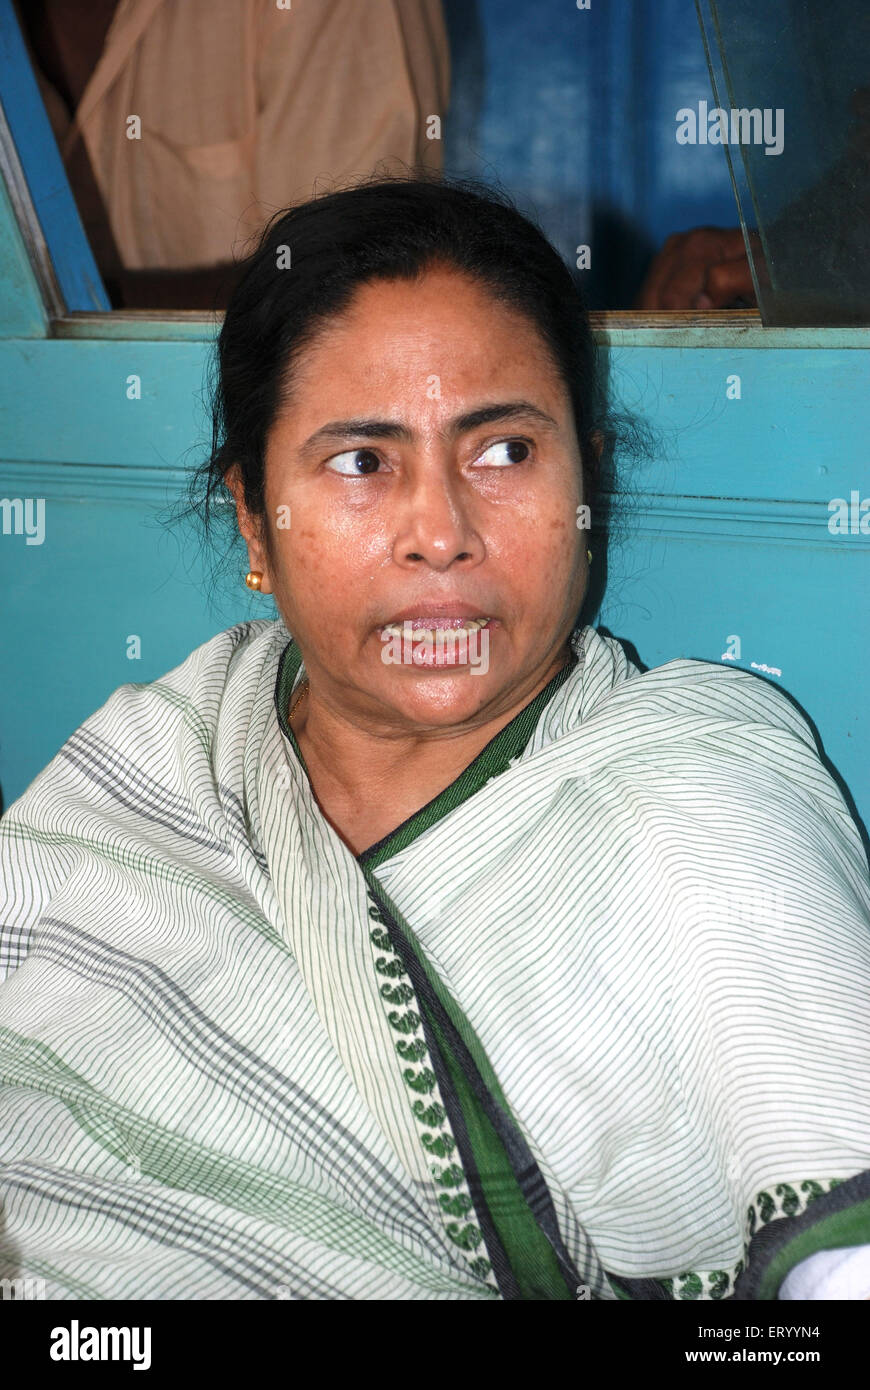 Railway minister Mamta Banerjee NO MR - Stock Image